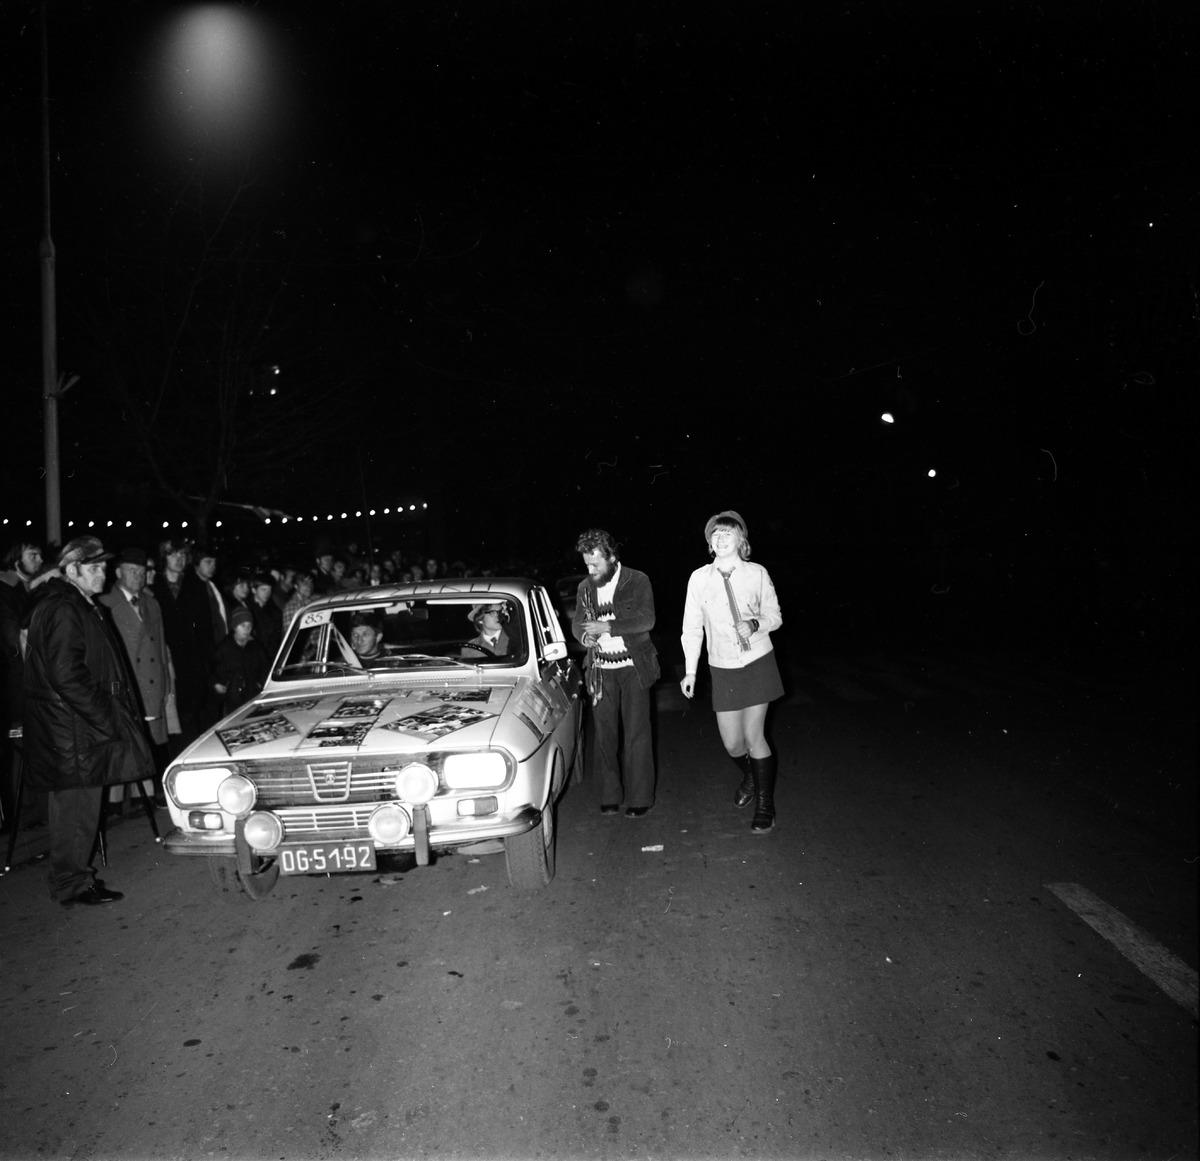 Filmowy Rajd Samochodowy, 1976 r. [7]